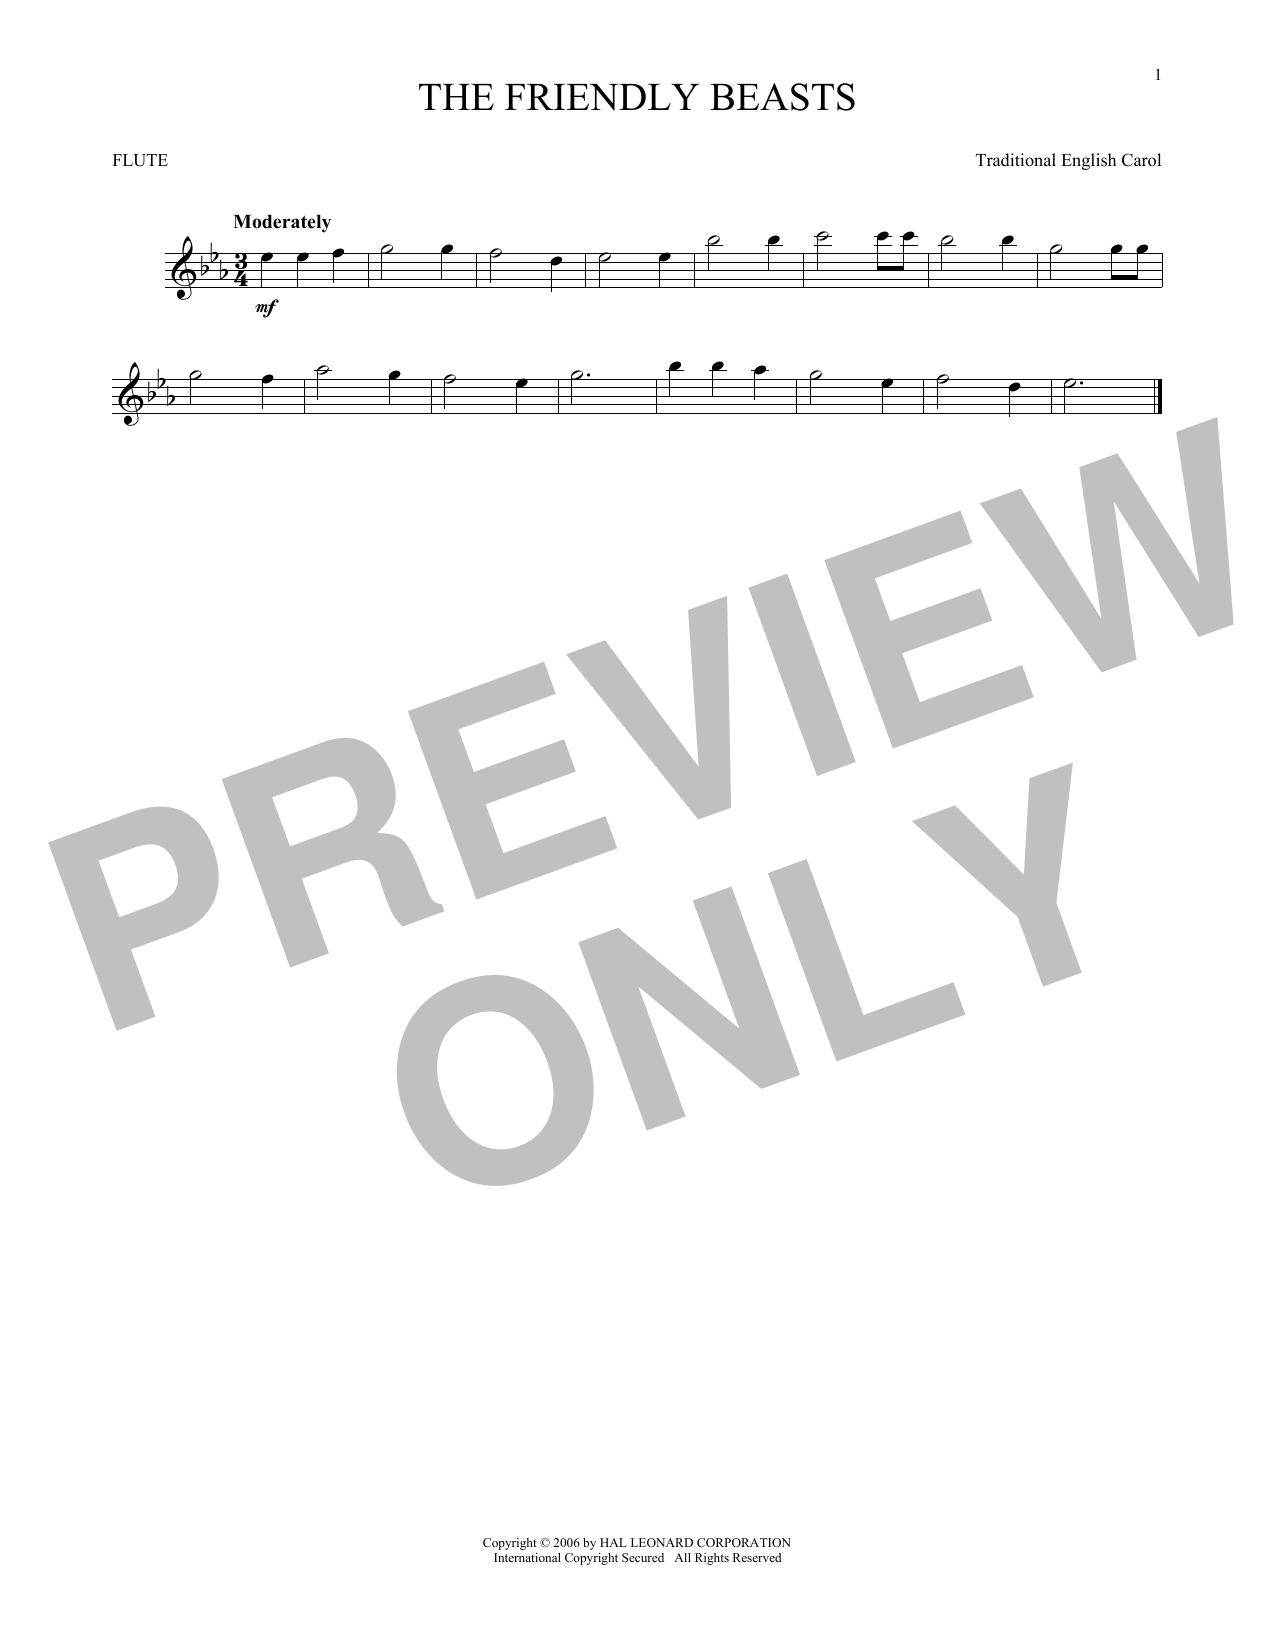 Partition flûte The Friendly Beasts de Traditional English Carol - Flute traversiere